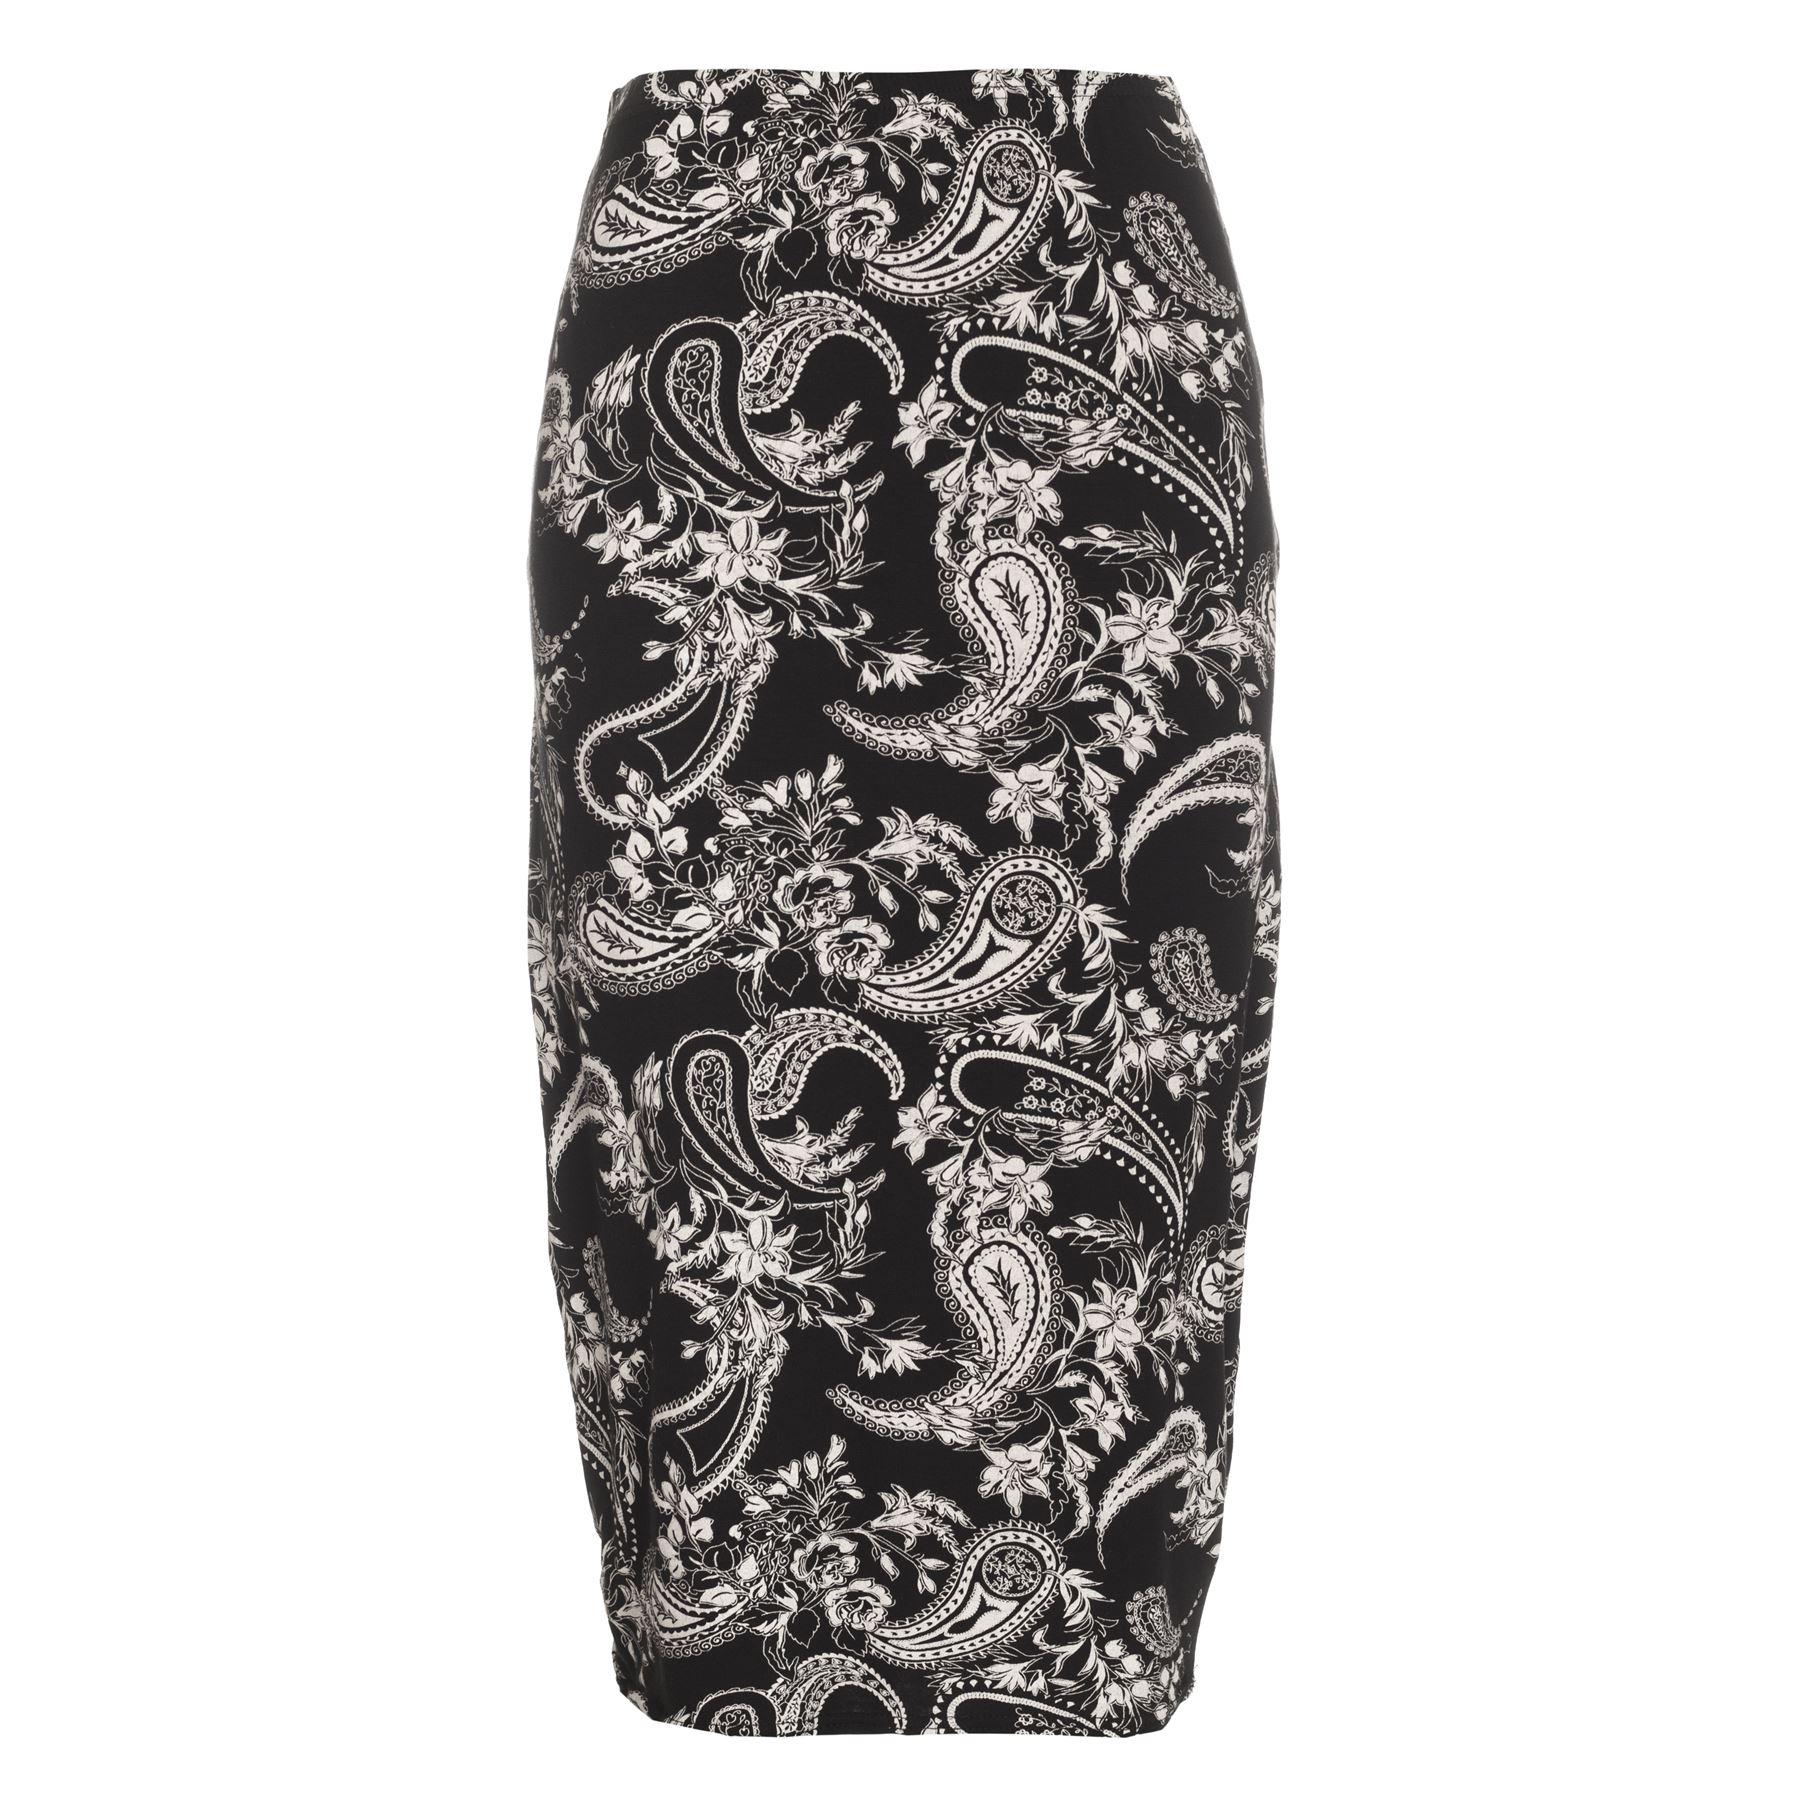 Womens Printed Stretchy High Waist Ladies Wiggle Tube Bodycon Pencil Midi Skirt